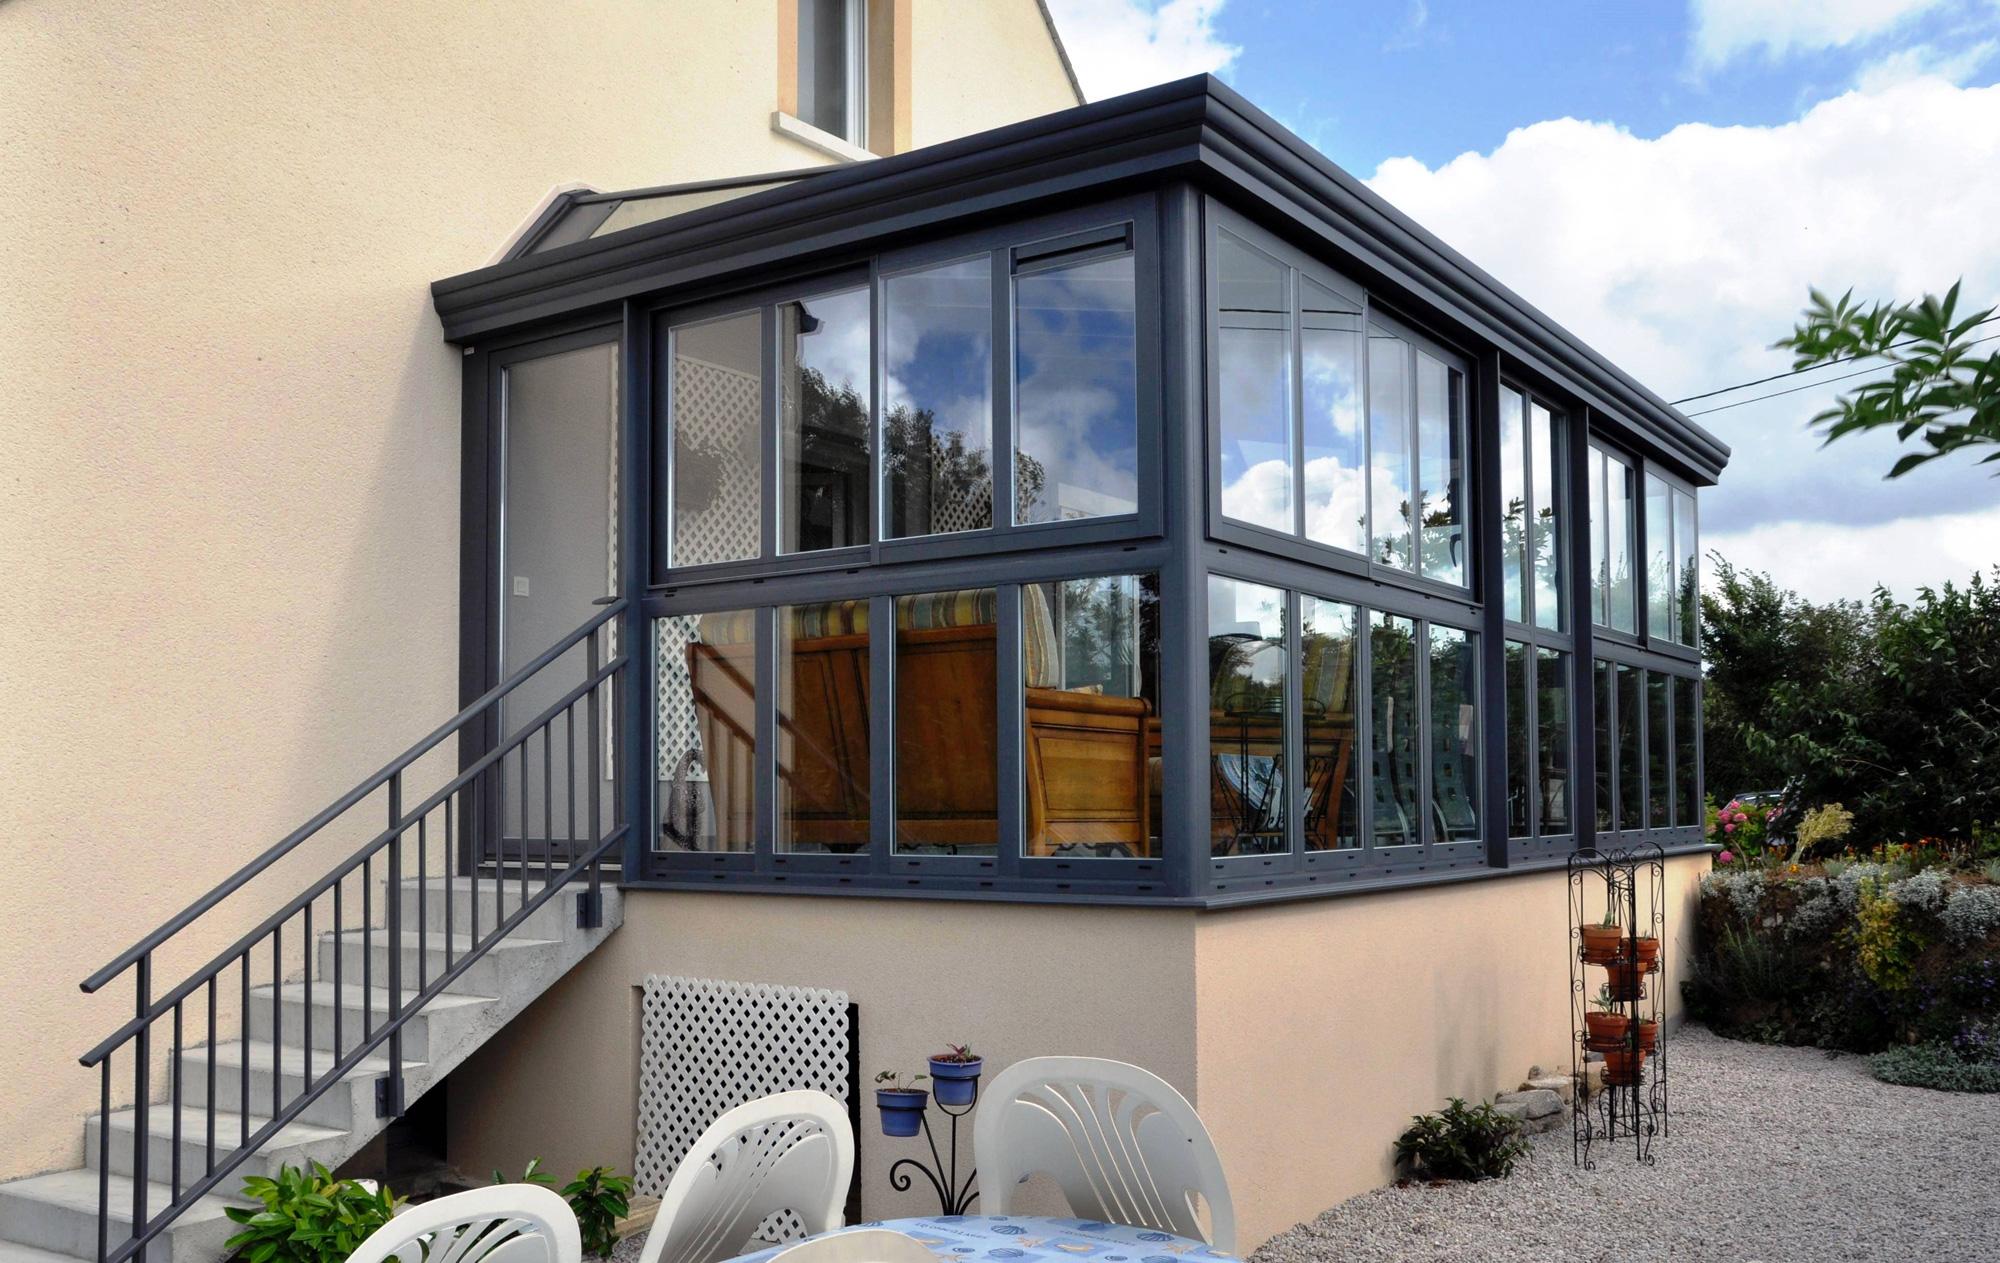 Alu Glass Fabricant De Veranda Et De Menuiseries Aluminium